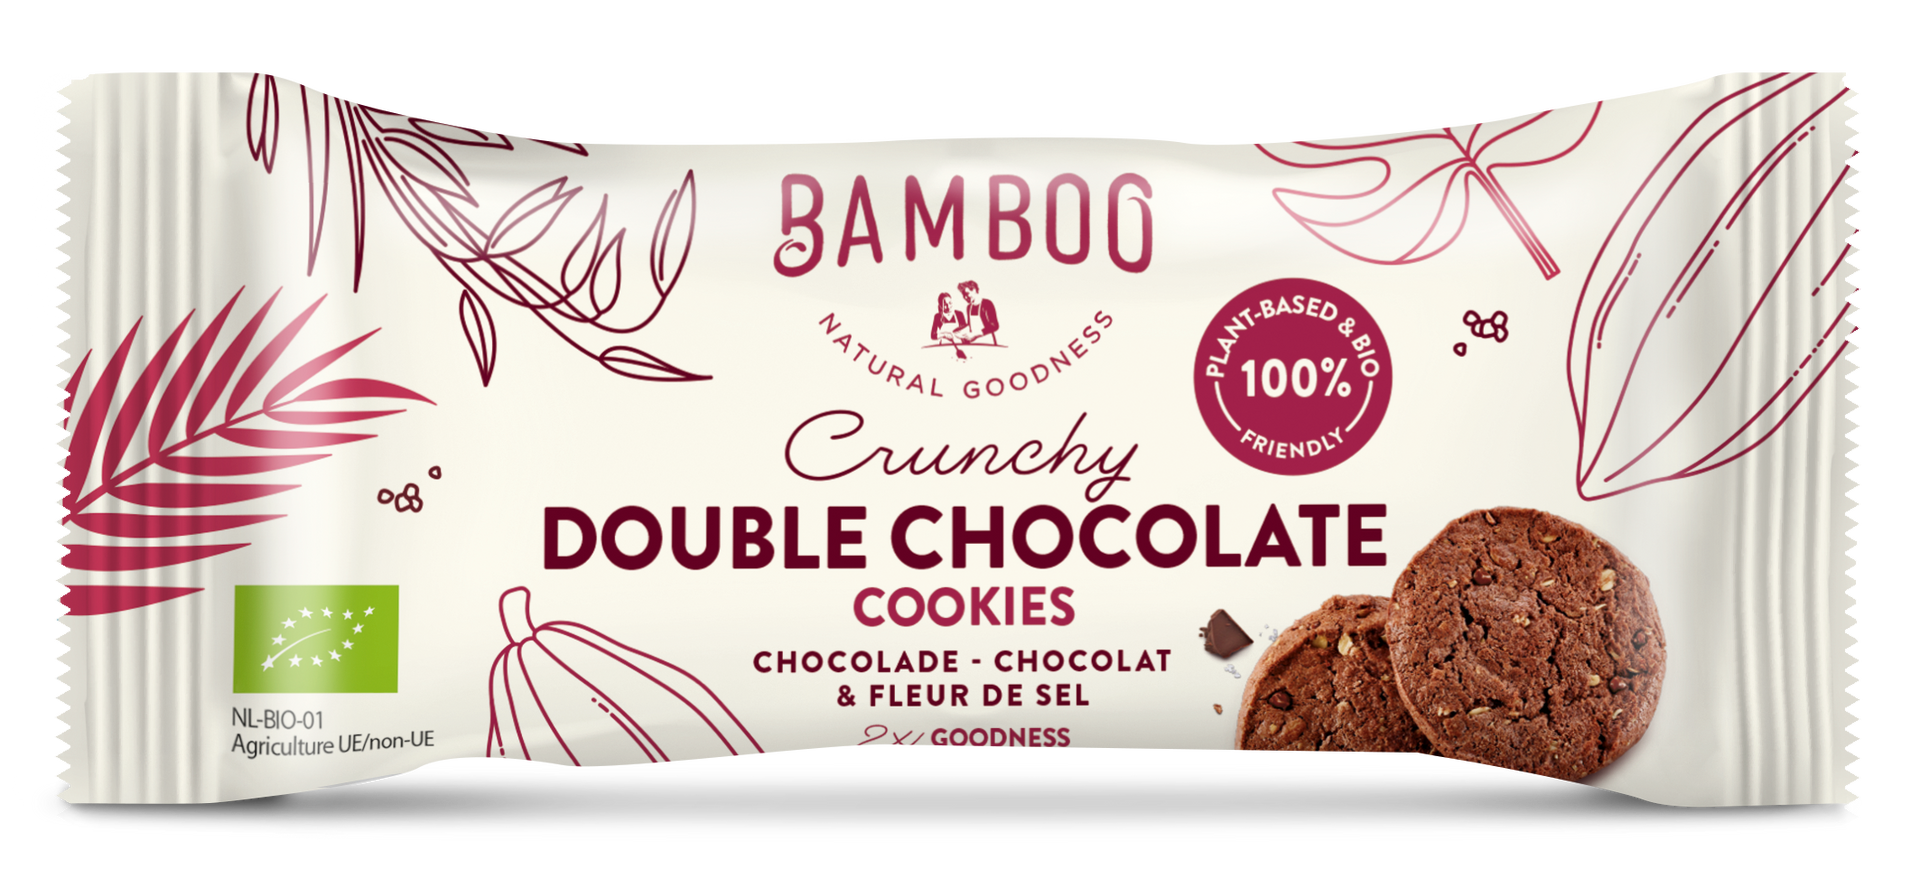 Bamboo Portion pack Double Choco simu.pn